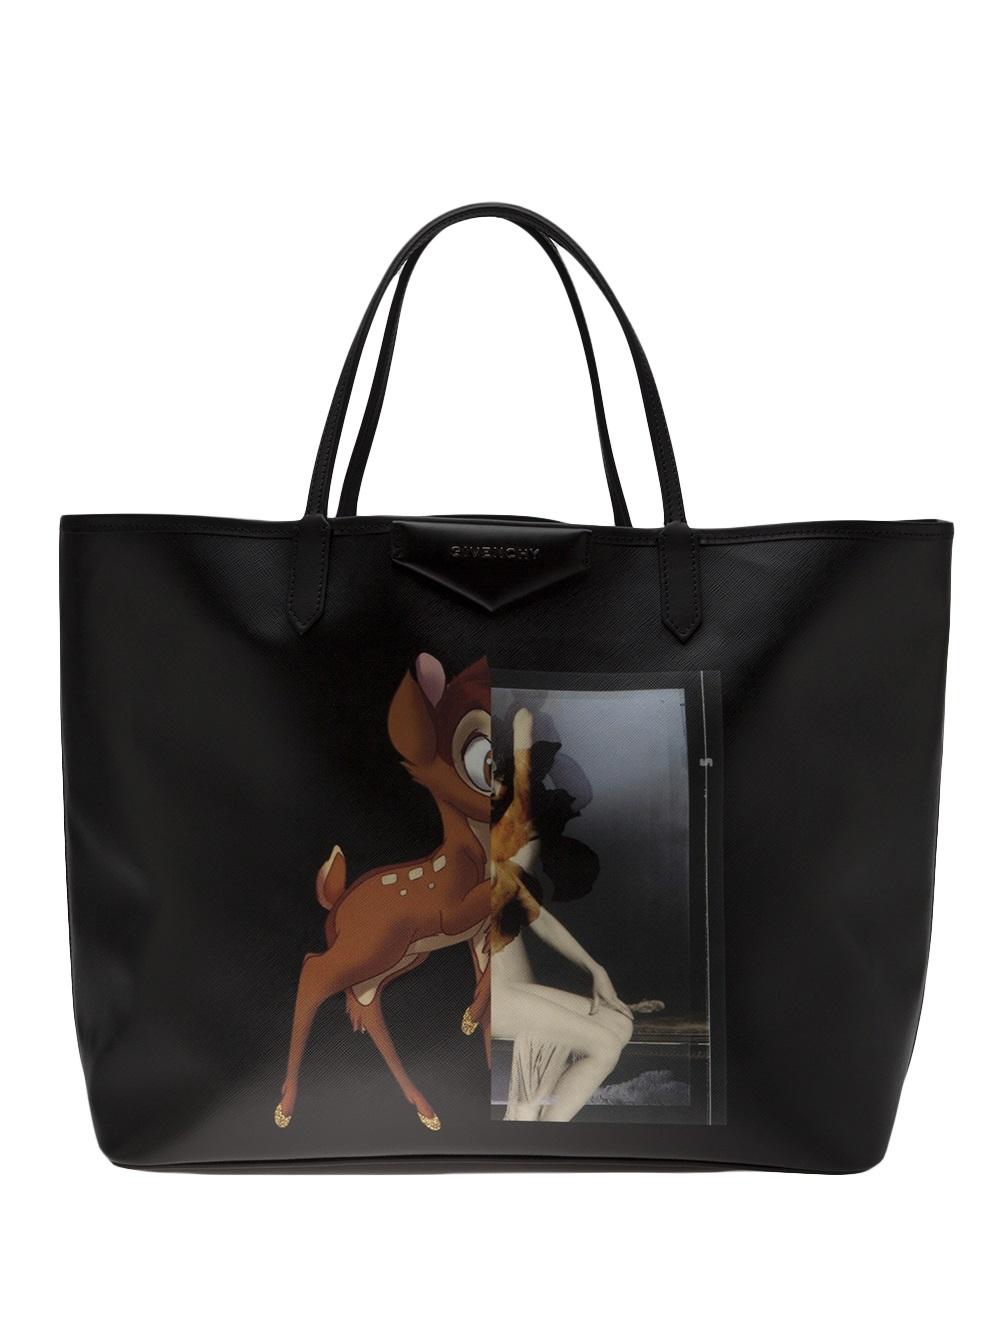 b689c63265 Givenchy Antigona Bambi Shopper in Black - Lyst